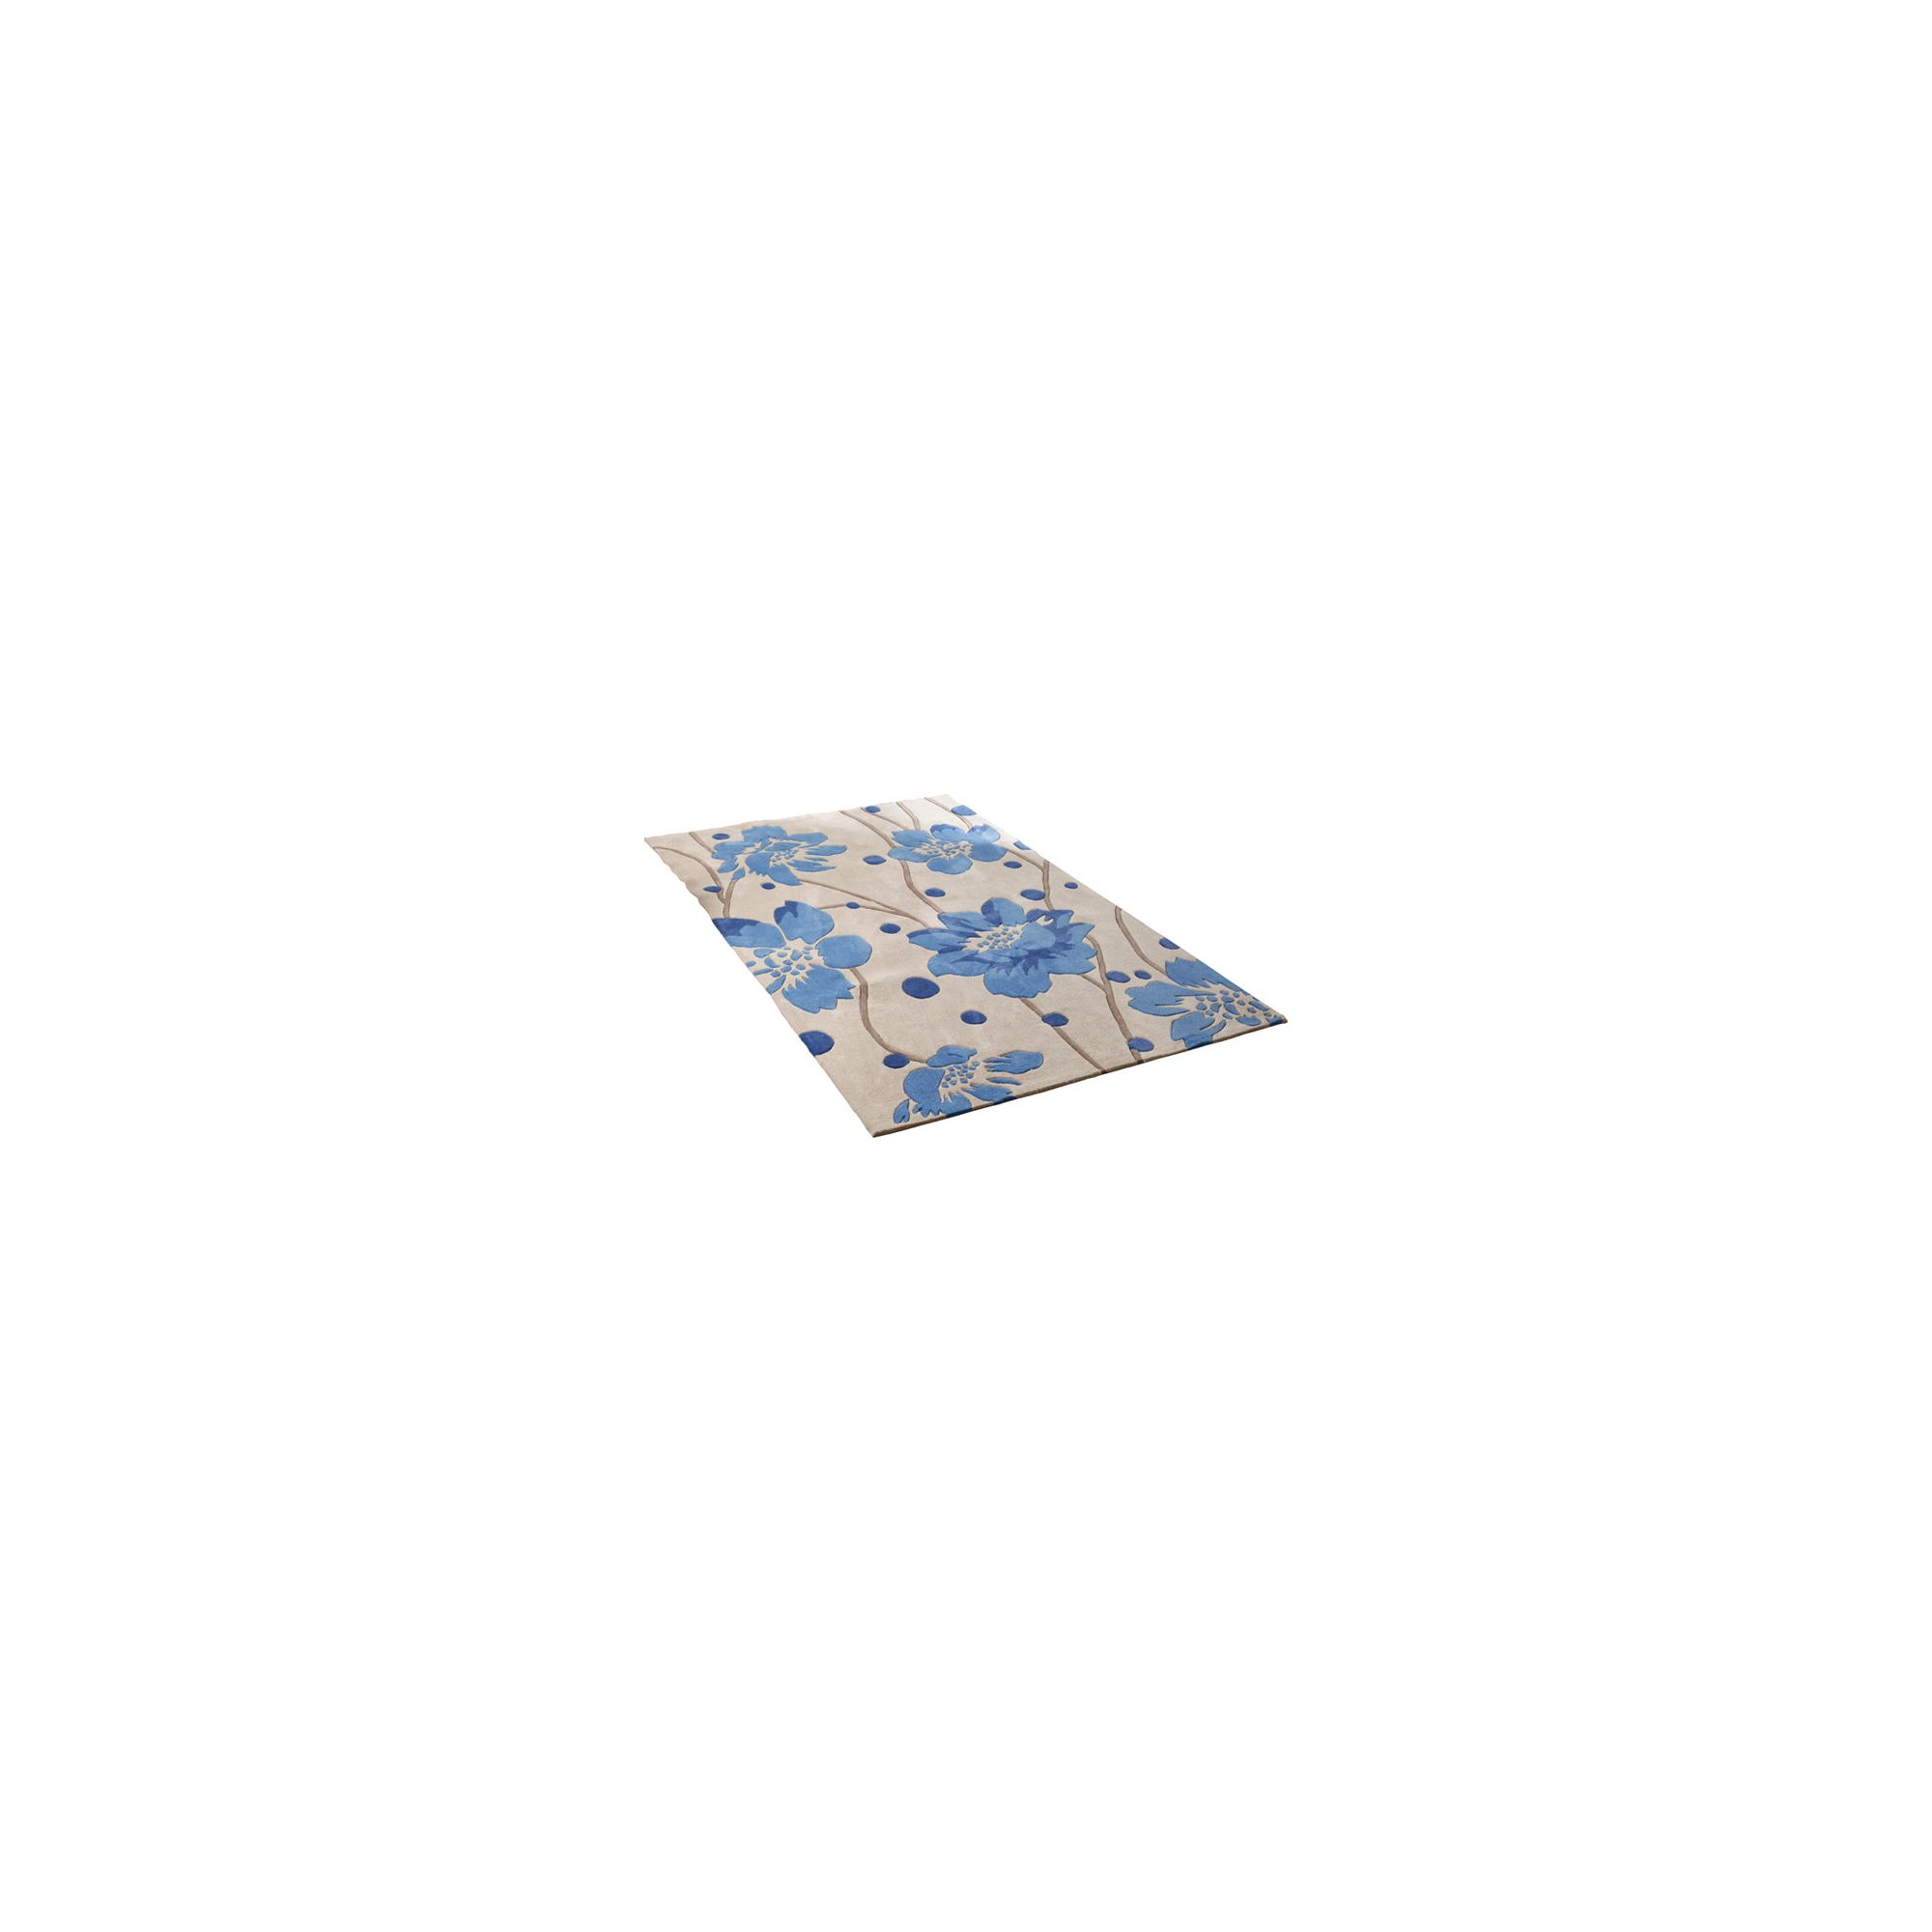 Oriental Carpets & Rugs Hong Kong Beige/Blue Tufted Rug - 150cm L x 90cm W